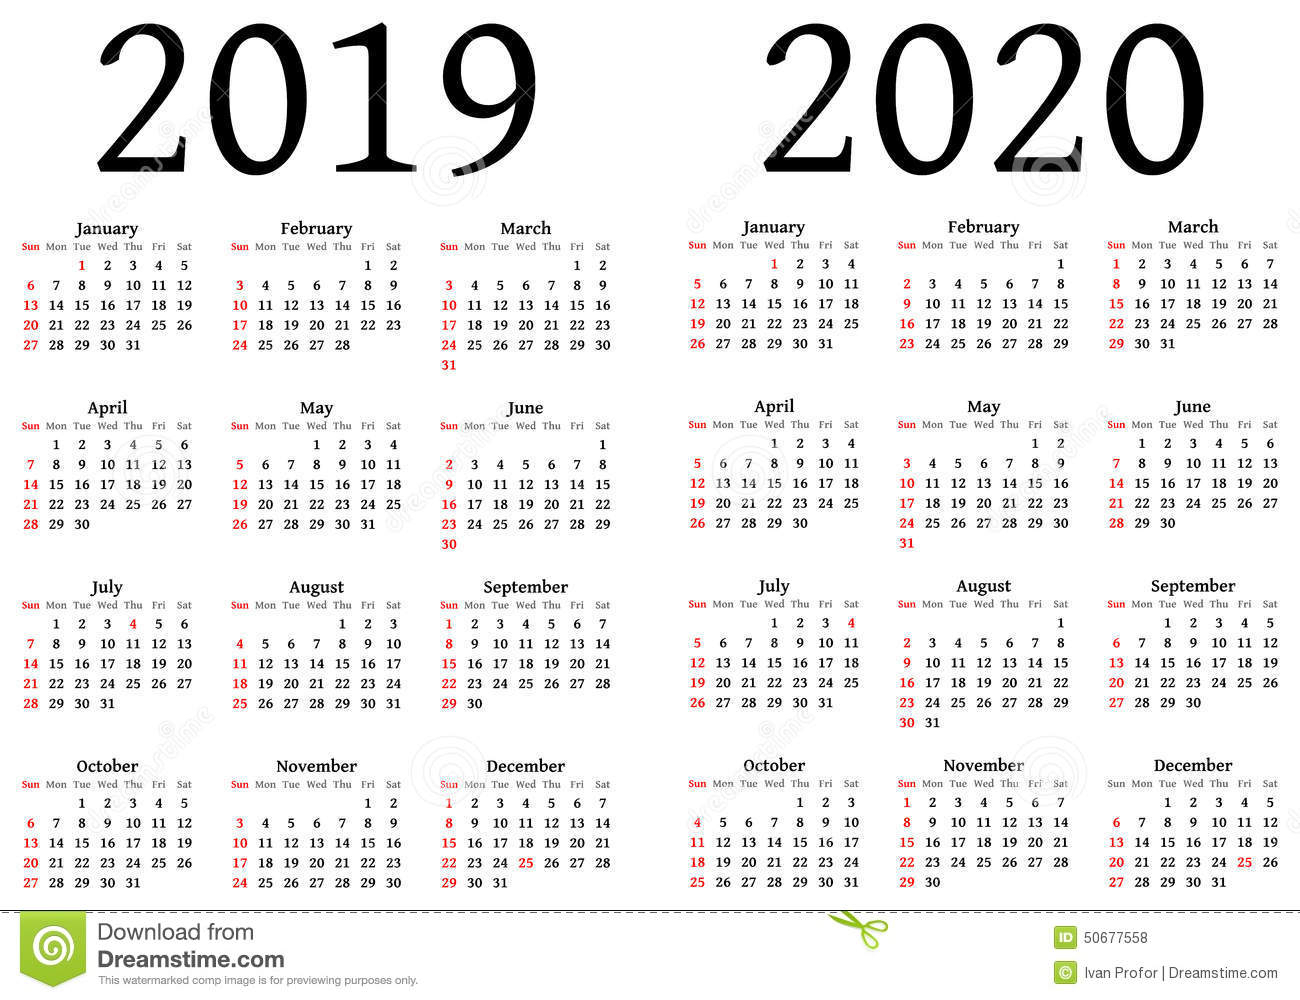 Printable Calendar For 2019 And 2020 | Printable Calendar 2019